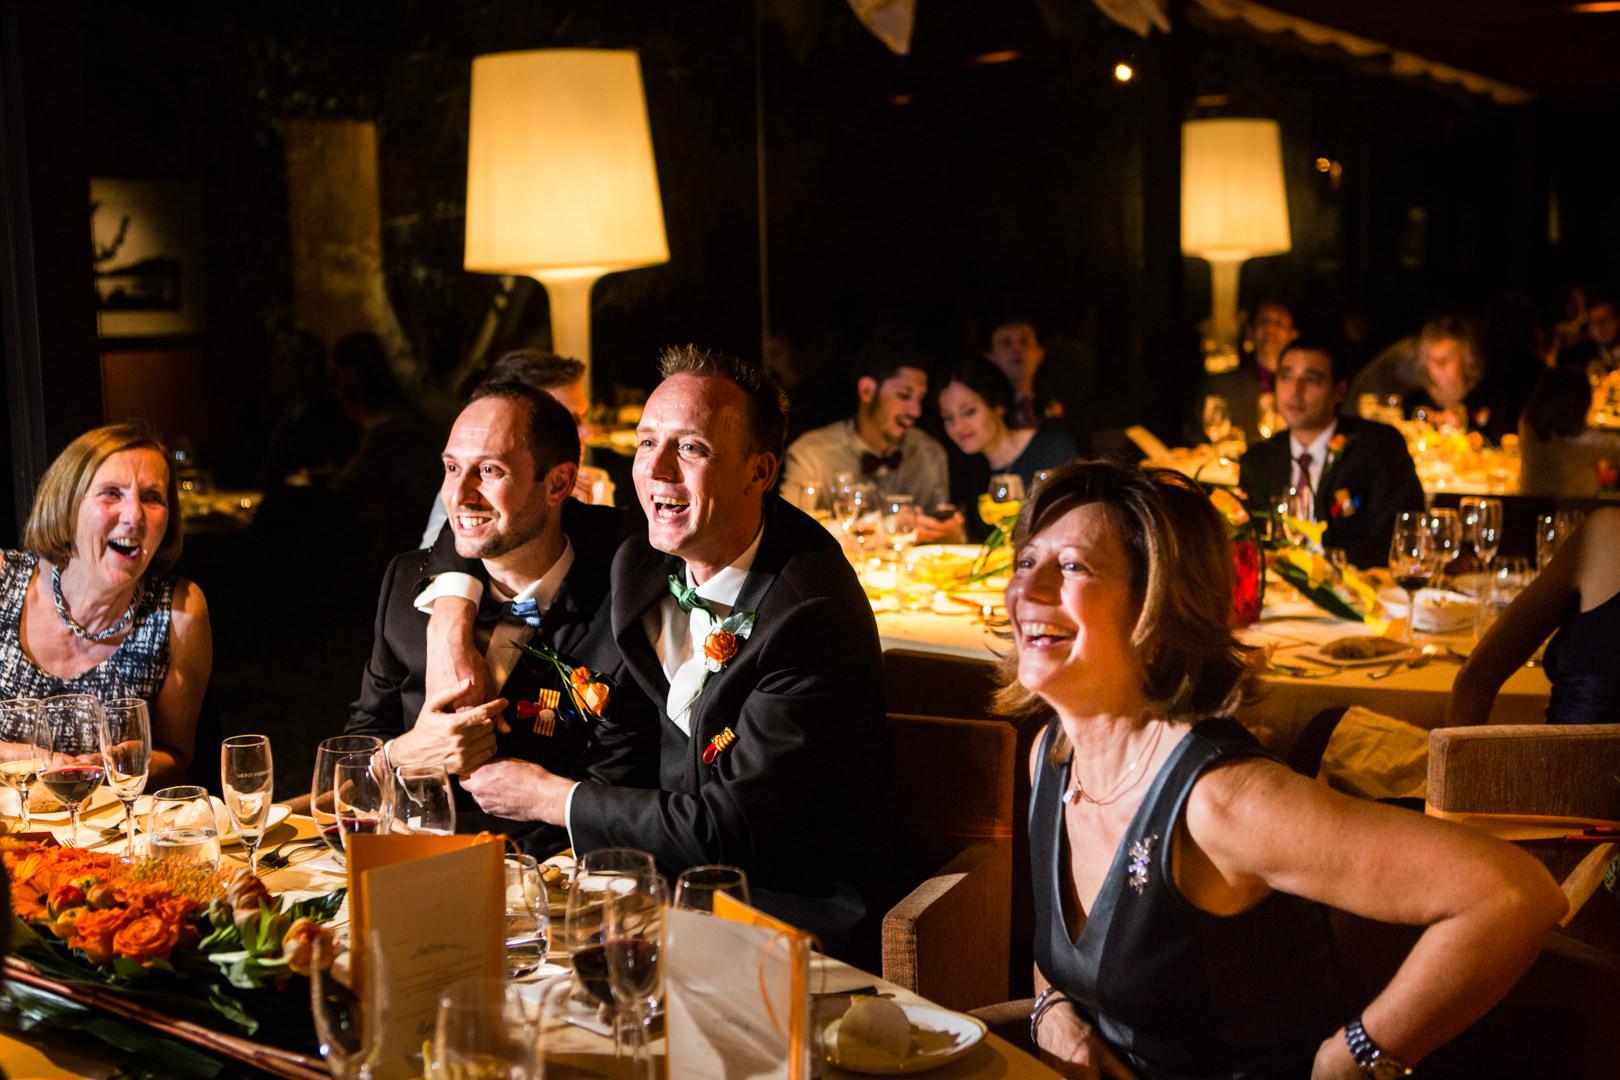 Same-sex-wedding-barcelona-boda- gay-samesex-engagement-Rafael-Torres-fotografo-bodas-sevilla-madrid-barcelona-wedding-photographer--52.jpg